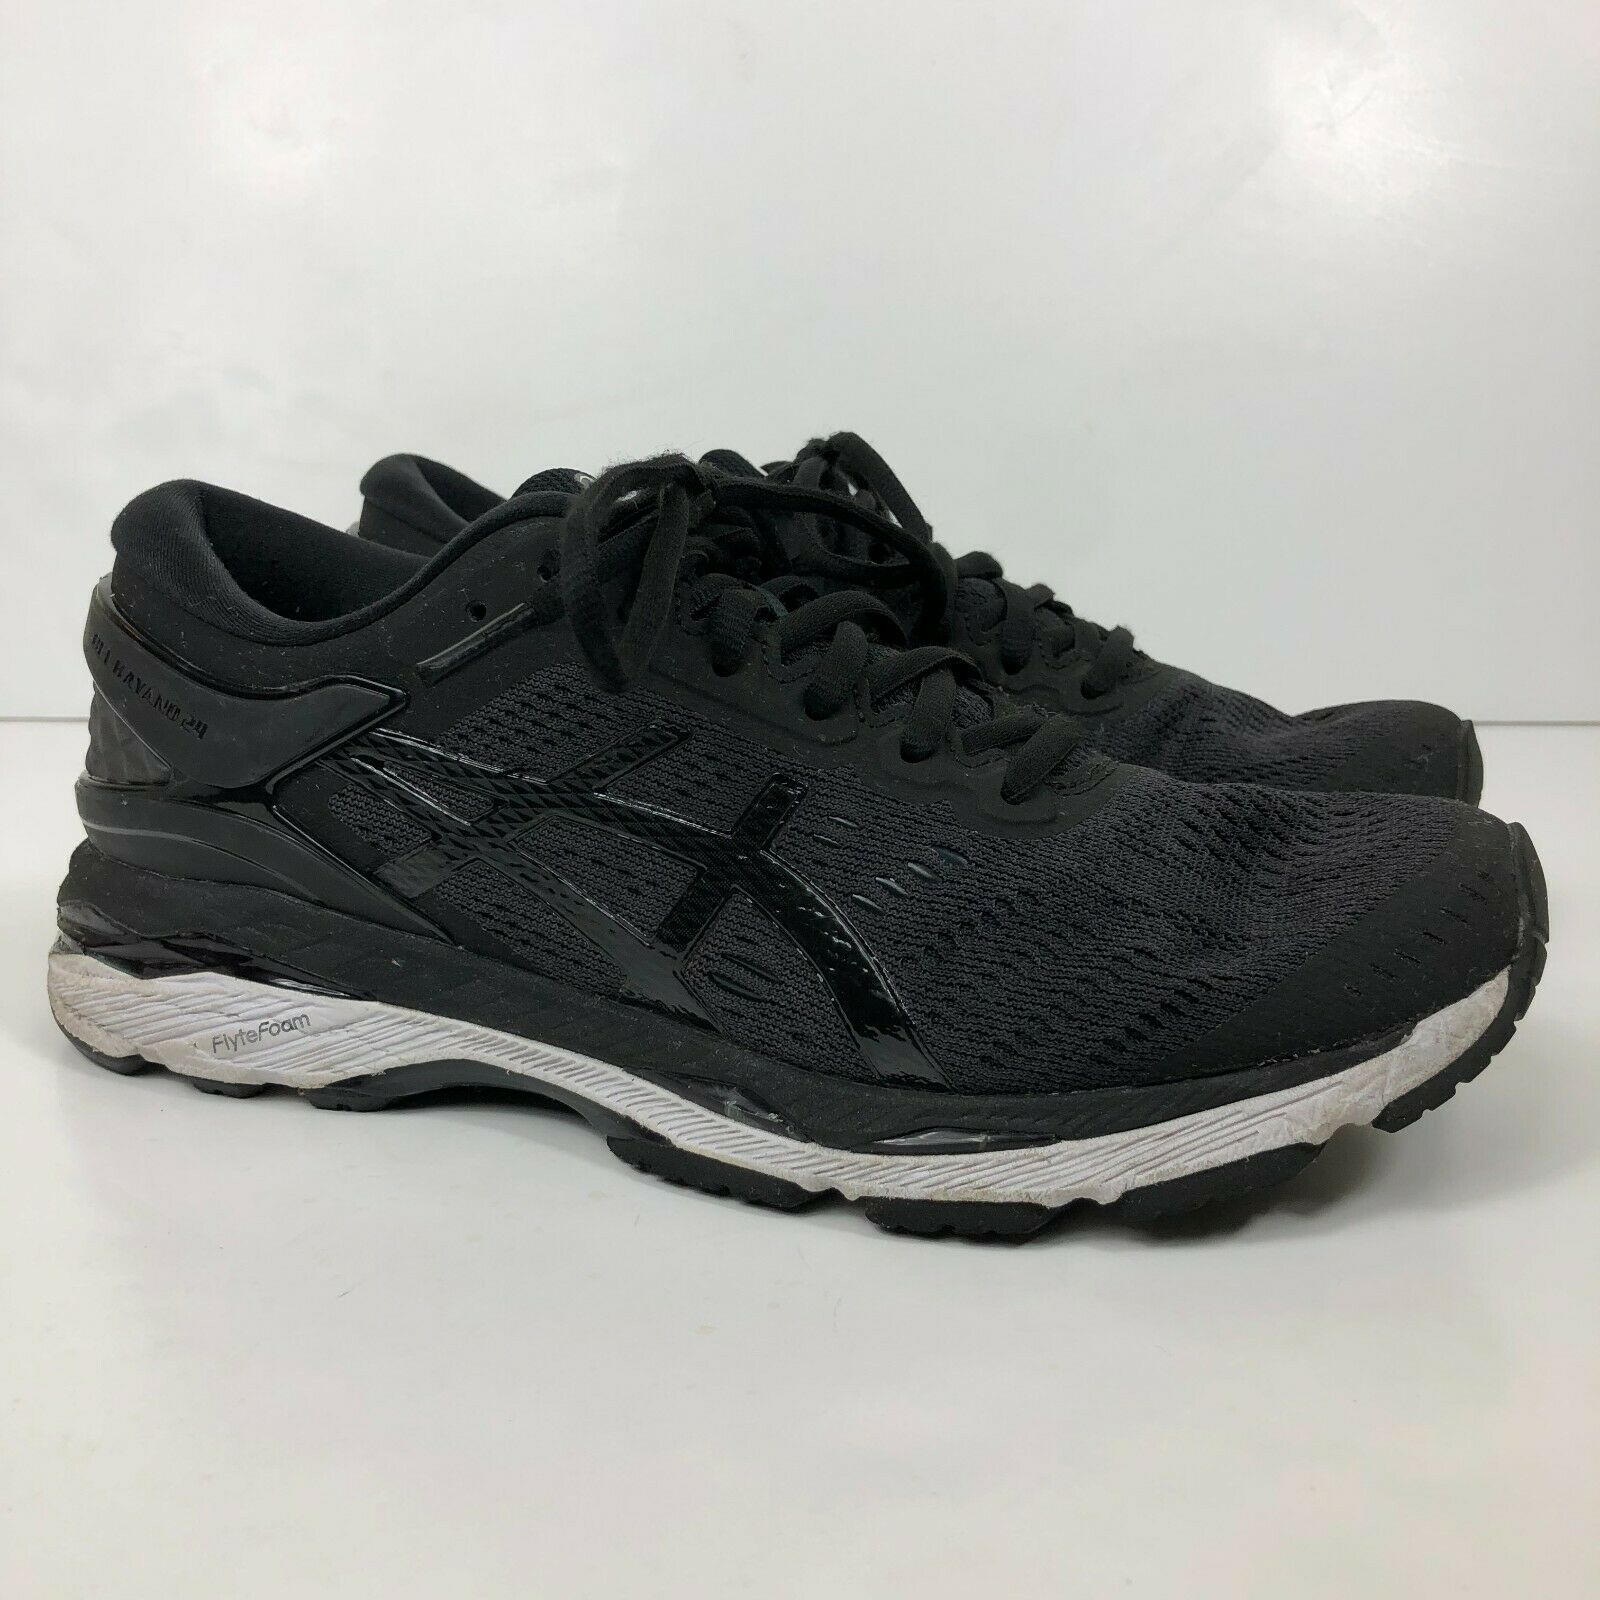 Tomate Seleccione cuidadosamente  ASICS Women's GEL Kayano 24 Running Shoes Black Phantom White Size 12 US  for sale online | eBay